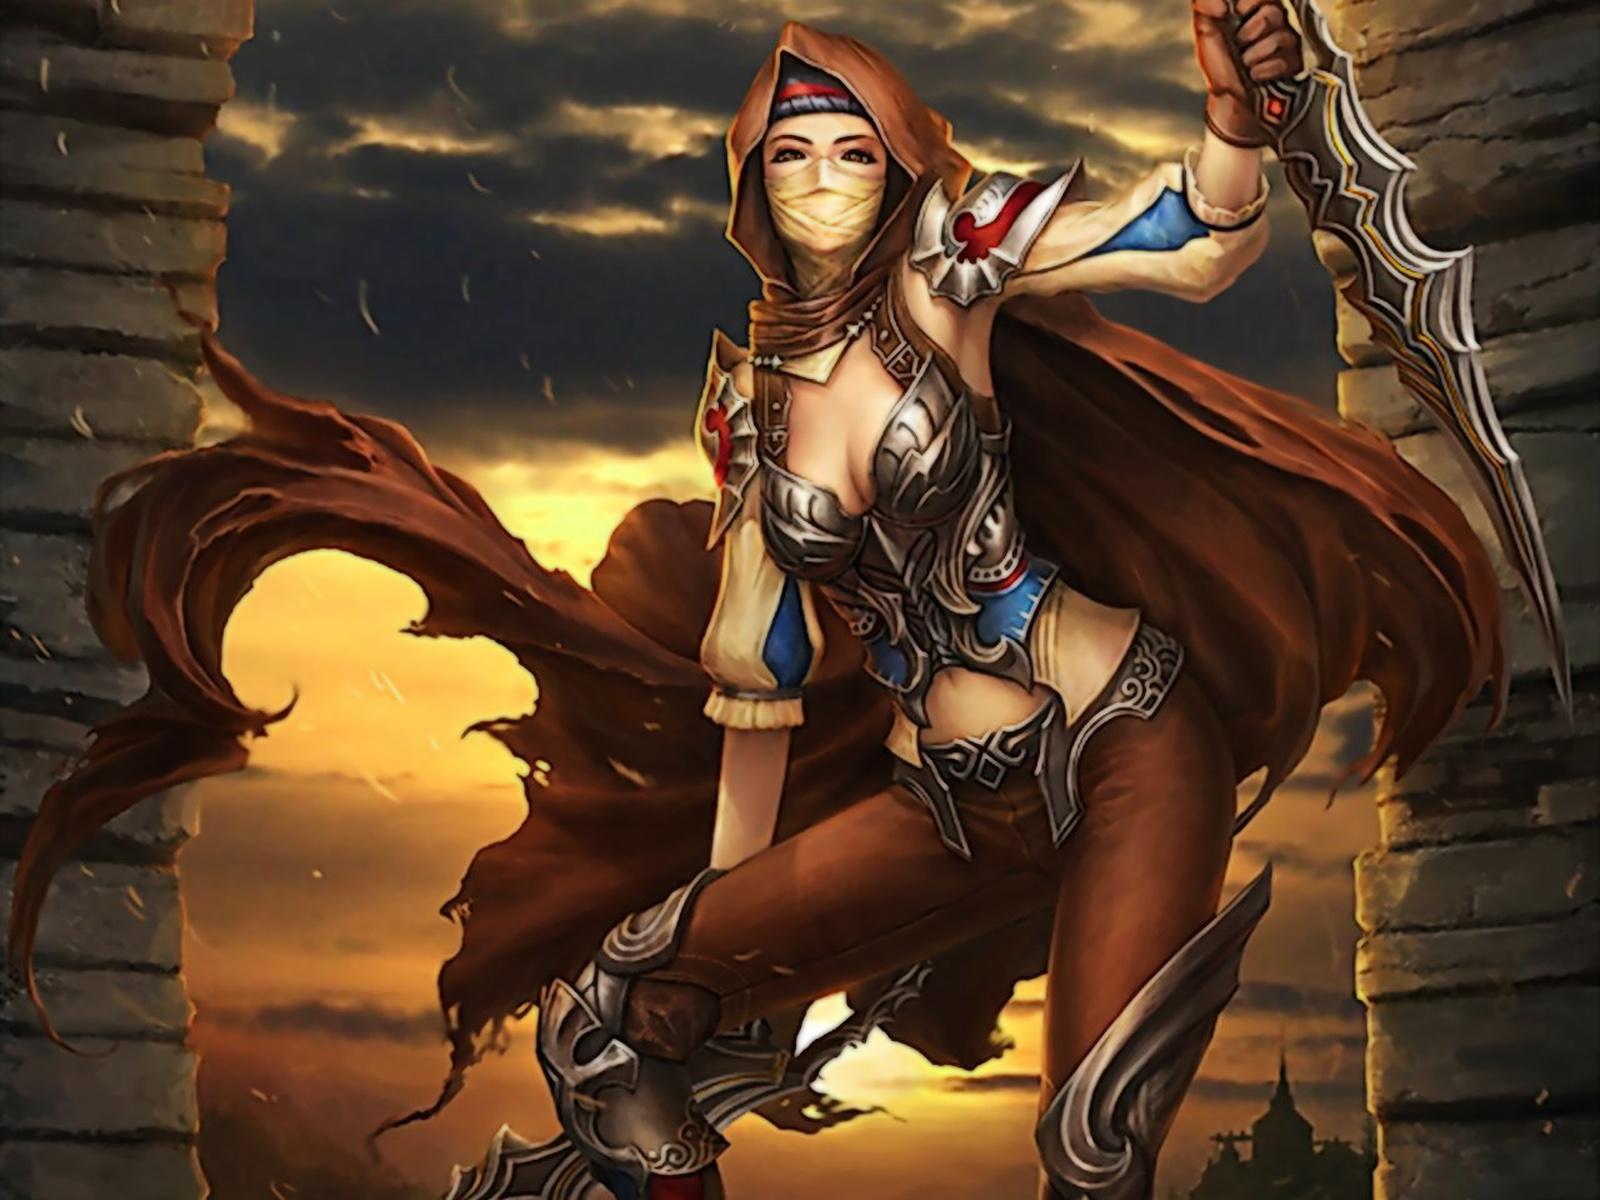 Hd fantasy warrior 10 - Fantasy female warrior artwork ...